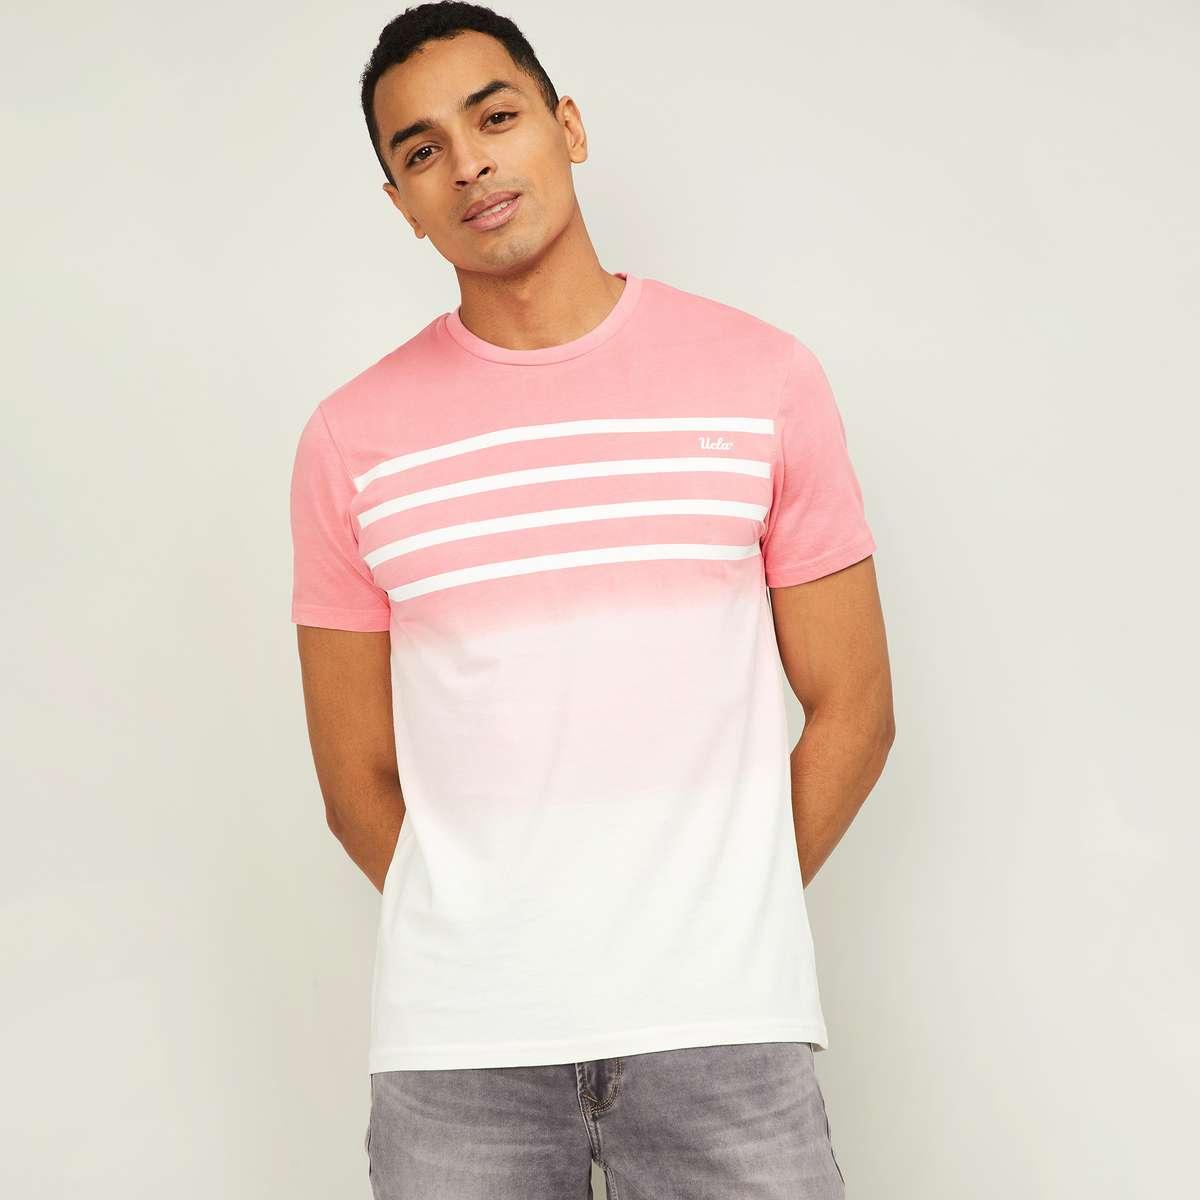 1.UCLA Men Ombre Regular Fit Crew Neck T-shirt